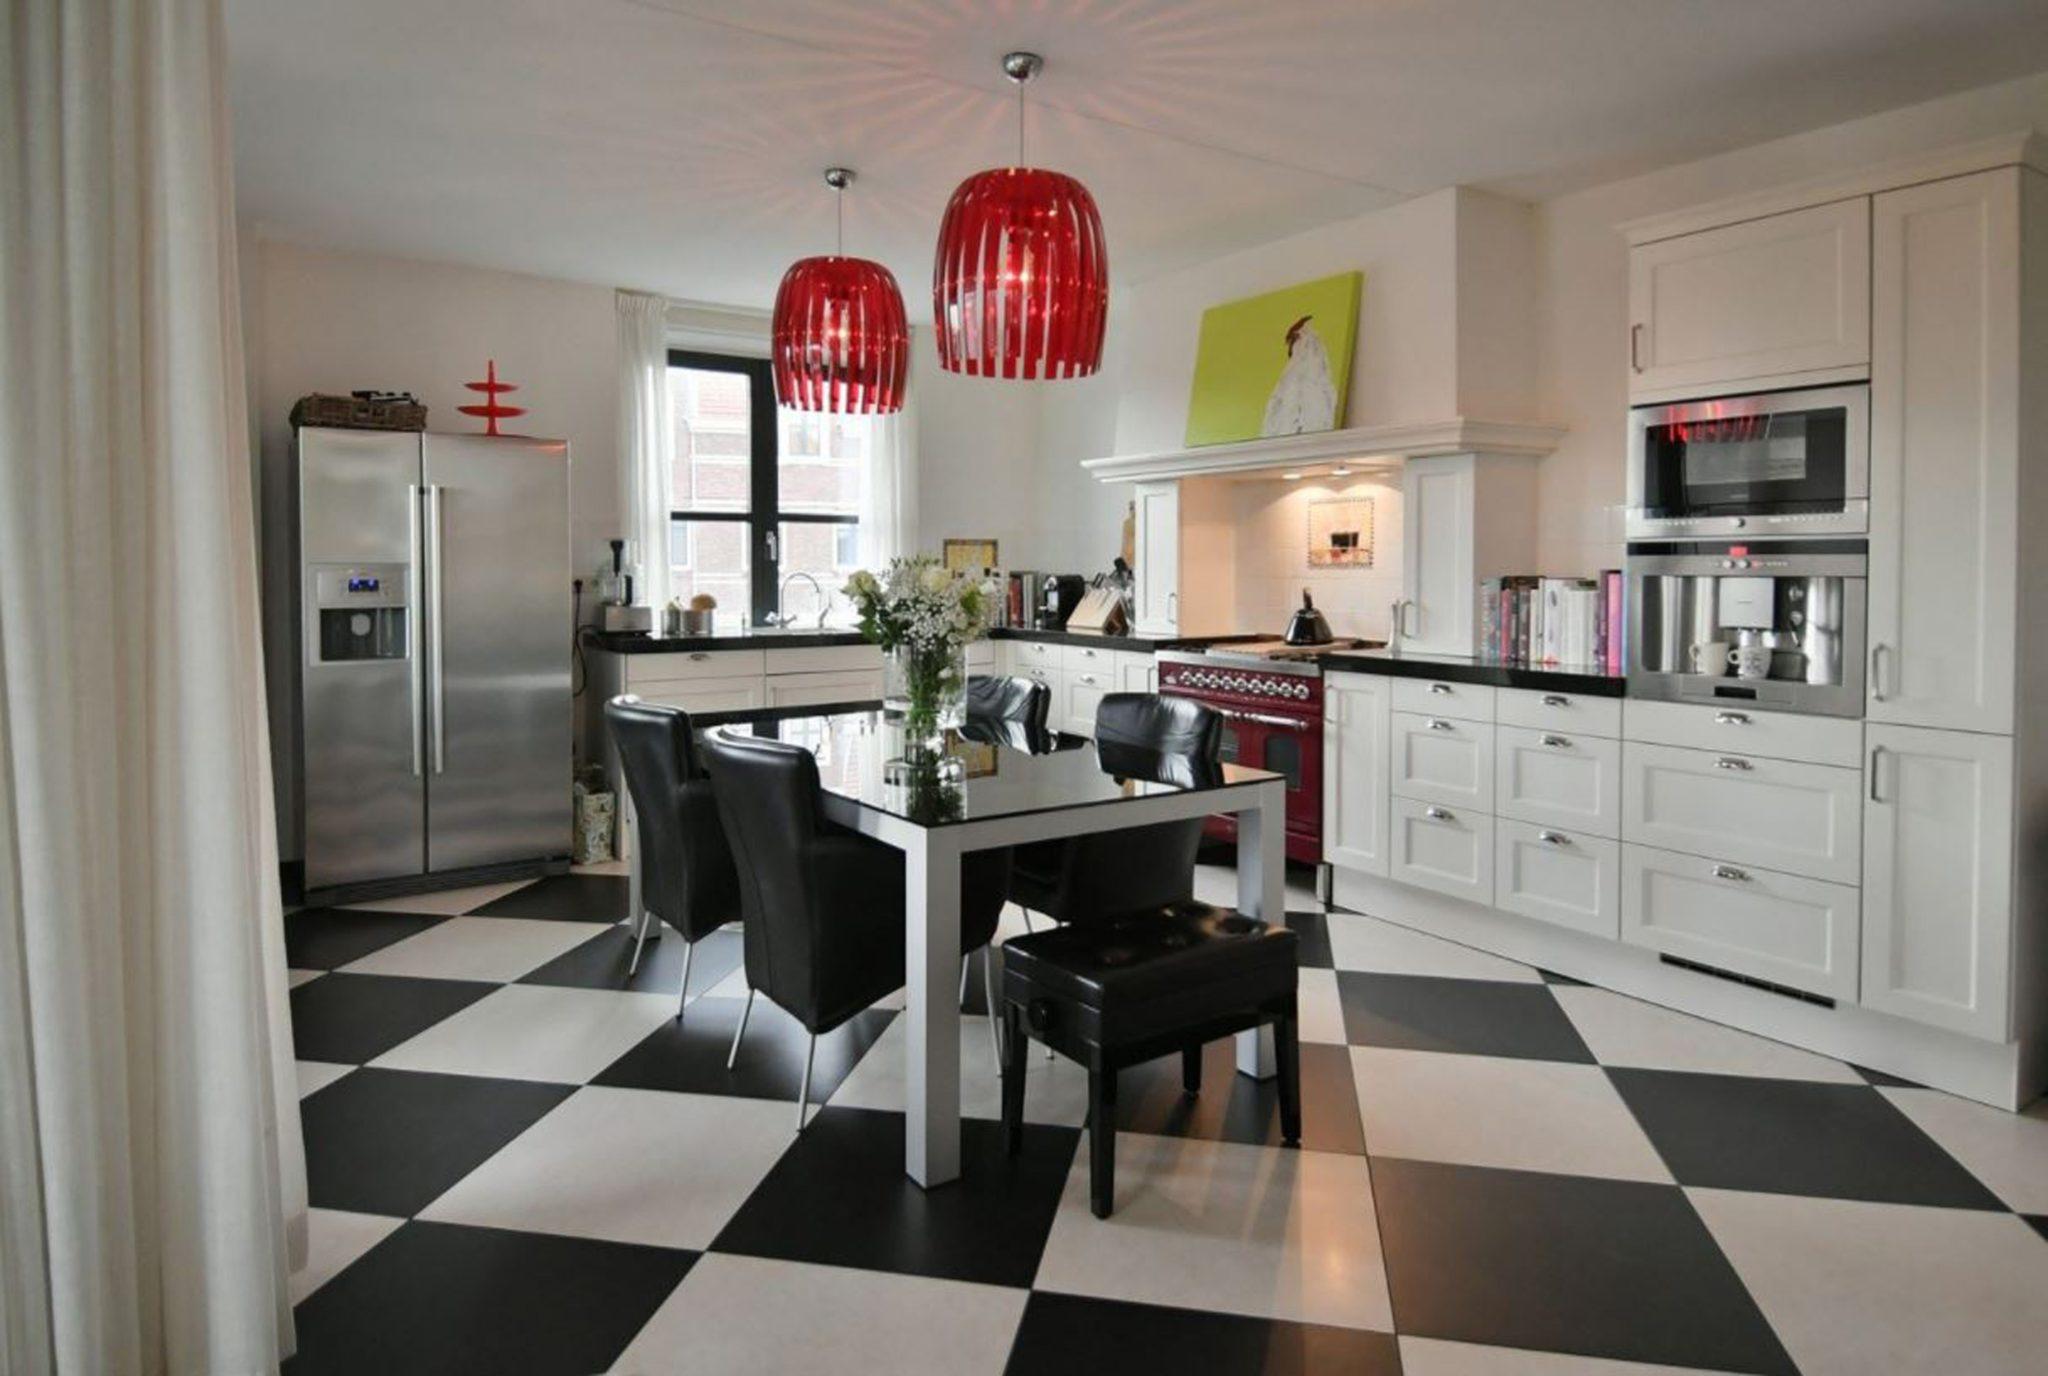 Royal retro family kitchen by Ingrid Bergman Interiors